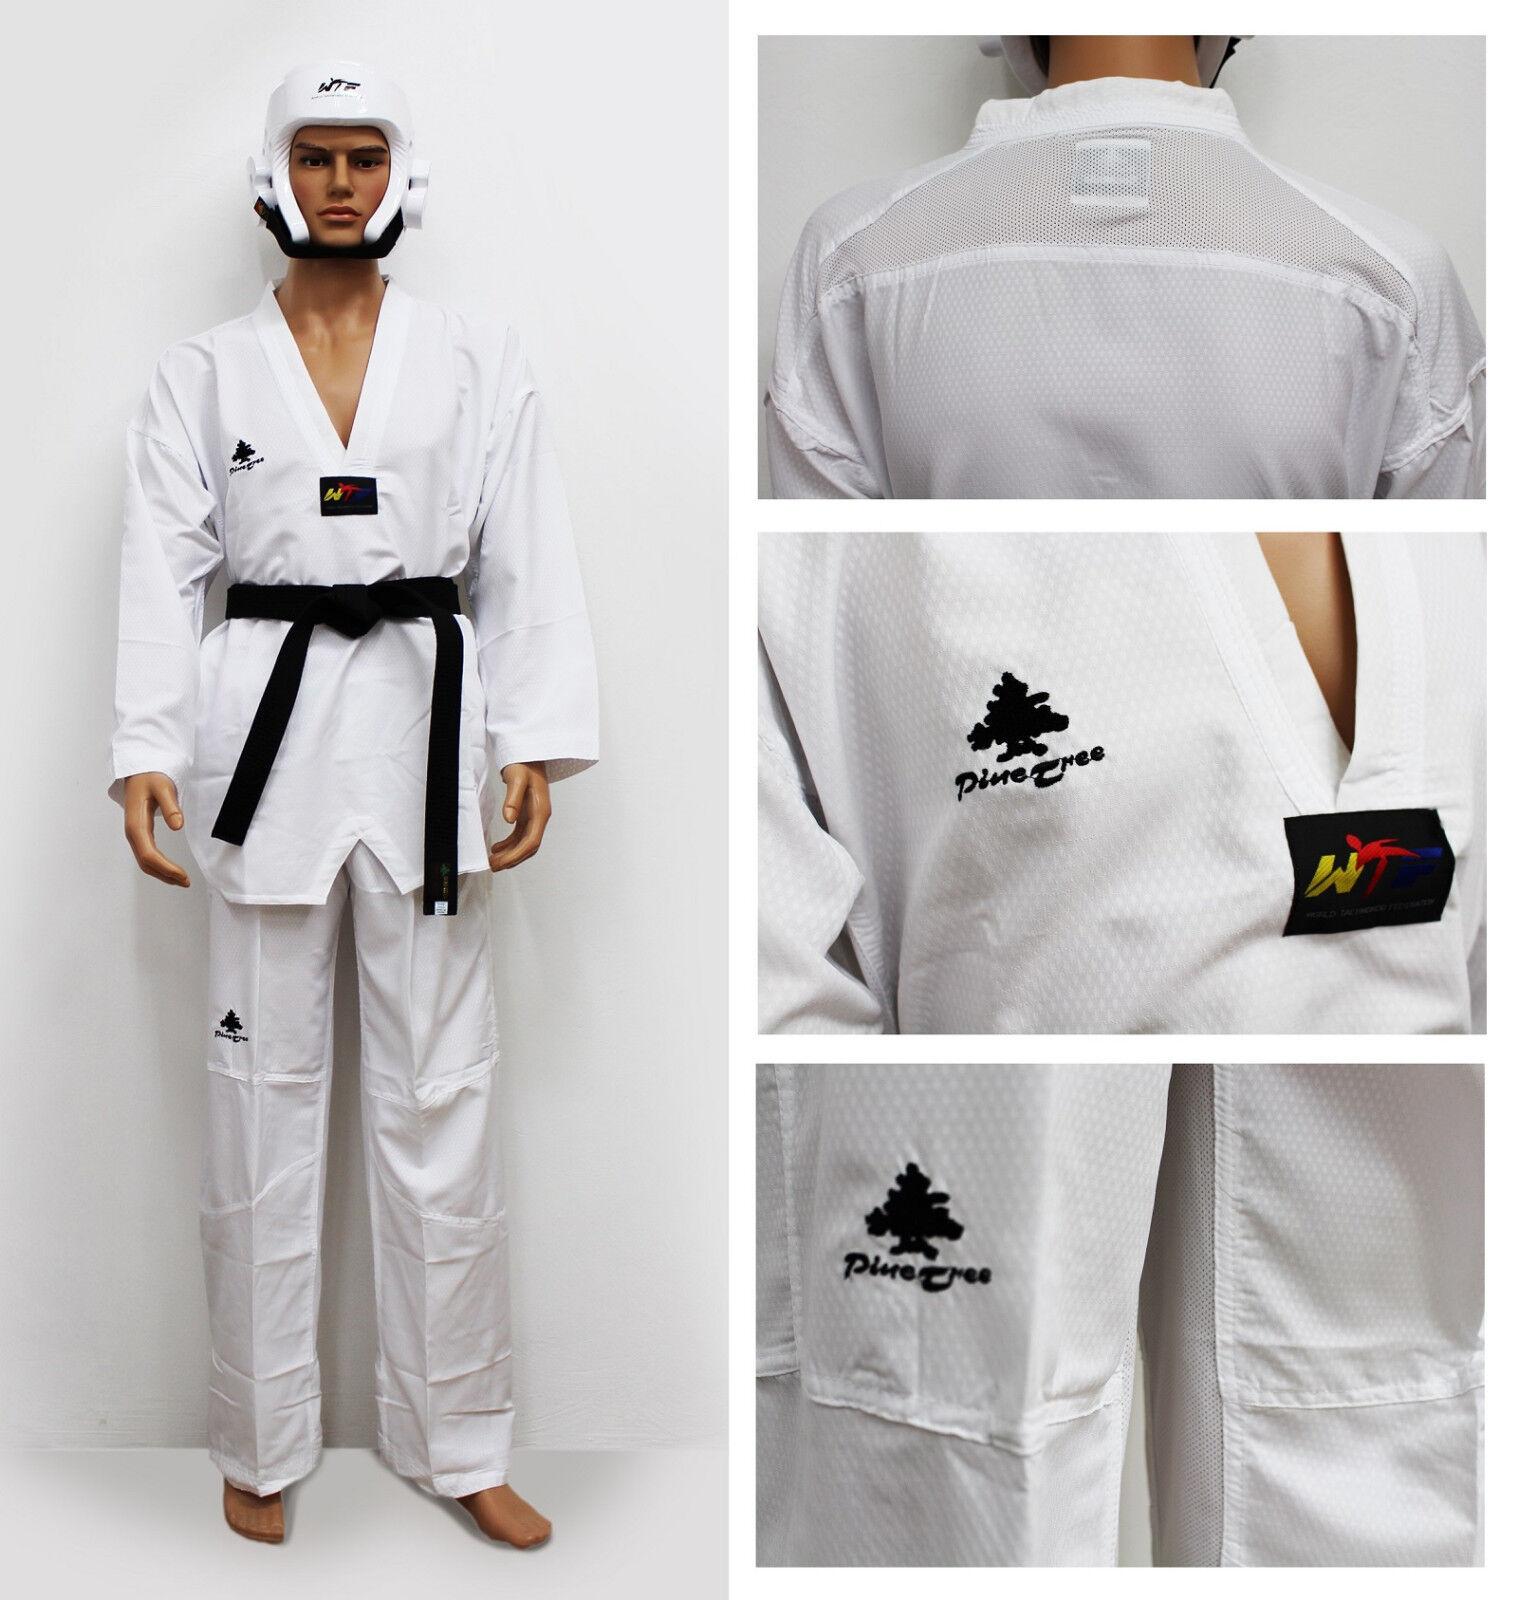 Professionale Taekwondo Judogi Ultralight Misto Materiale Tkd Completo